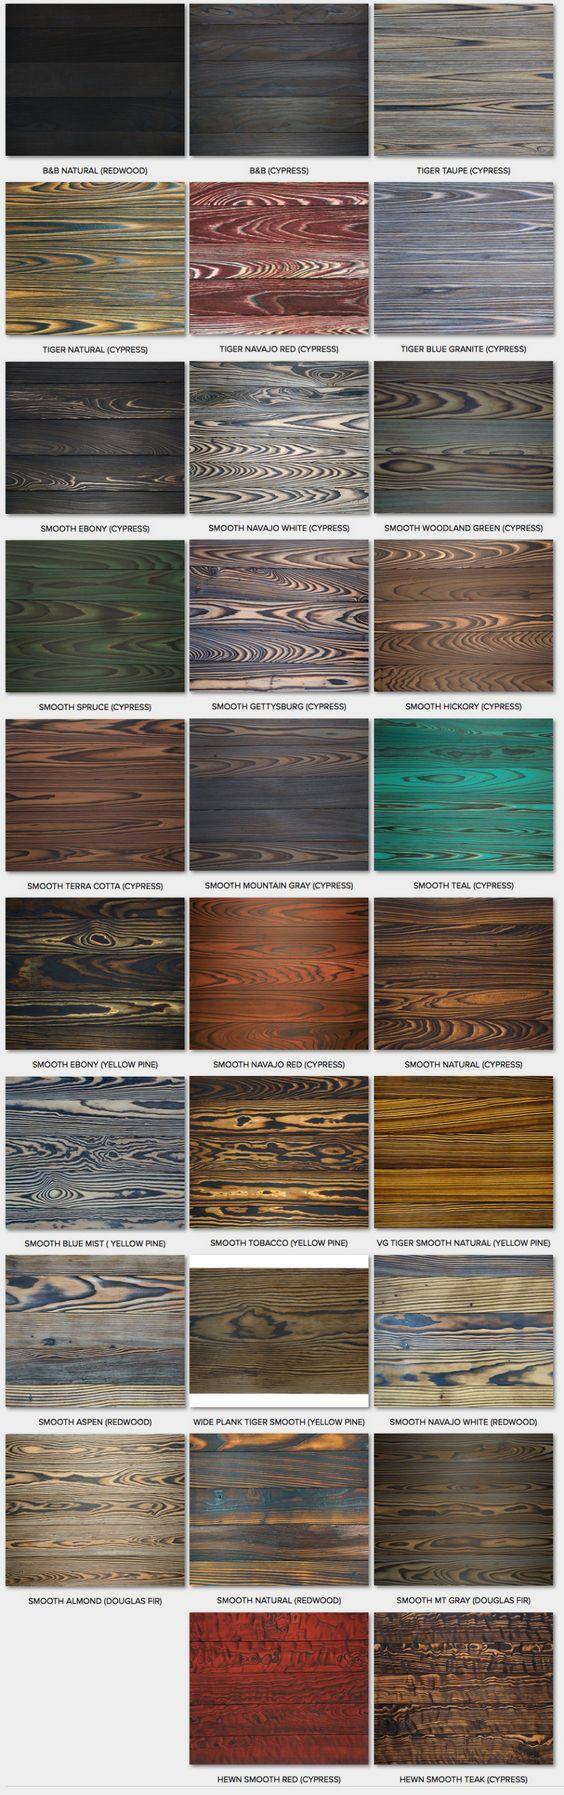 Best 25 Exterior Wood Stain Ideas On Pinterest Exterior Wood Stain Colors Outdoor Wood Stain